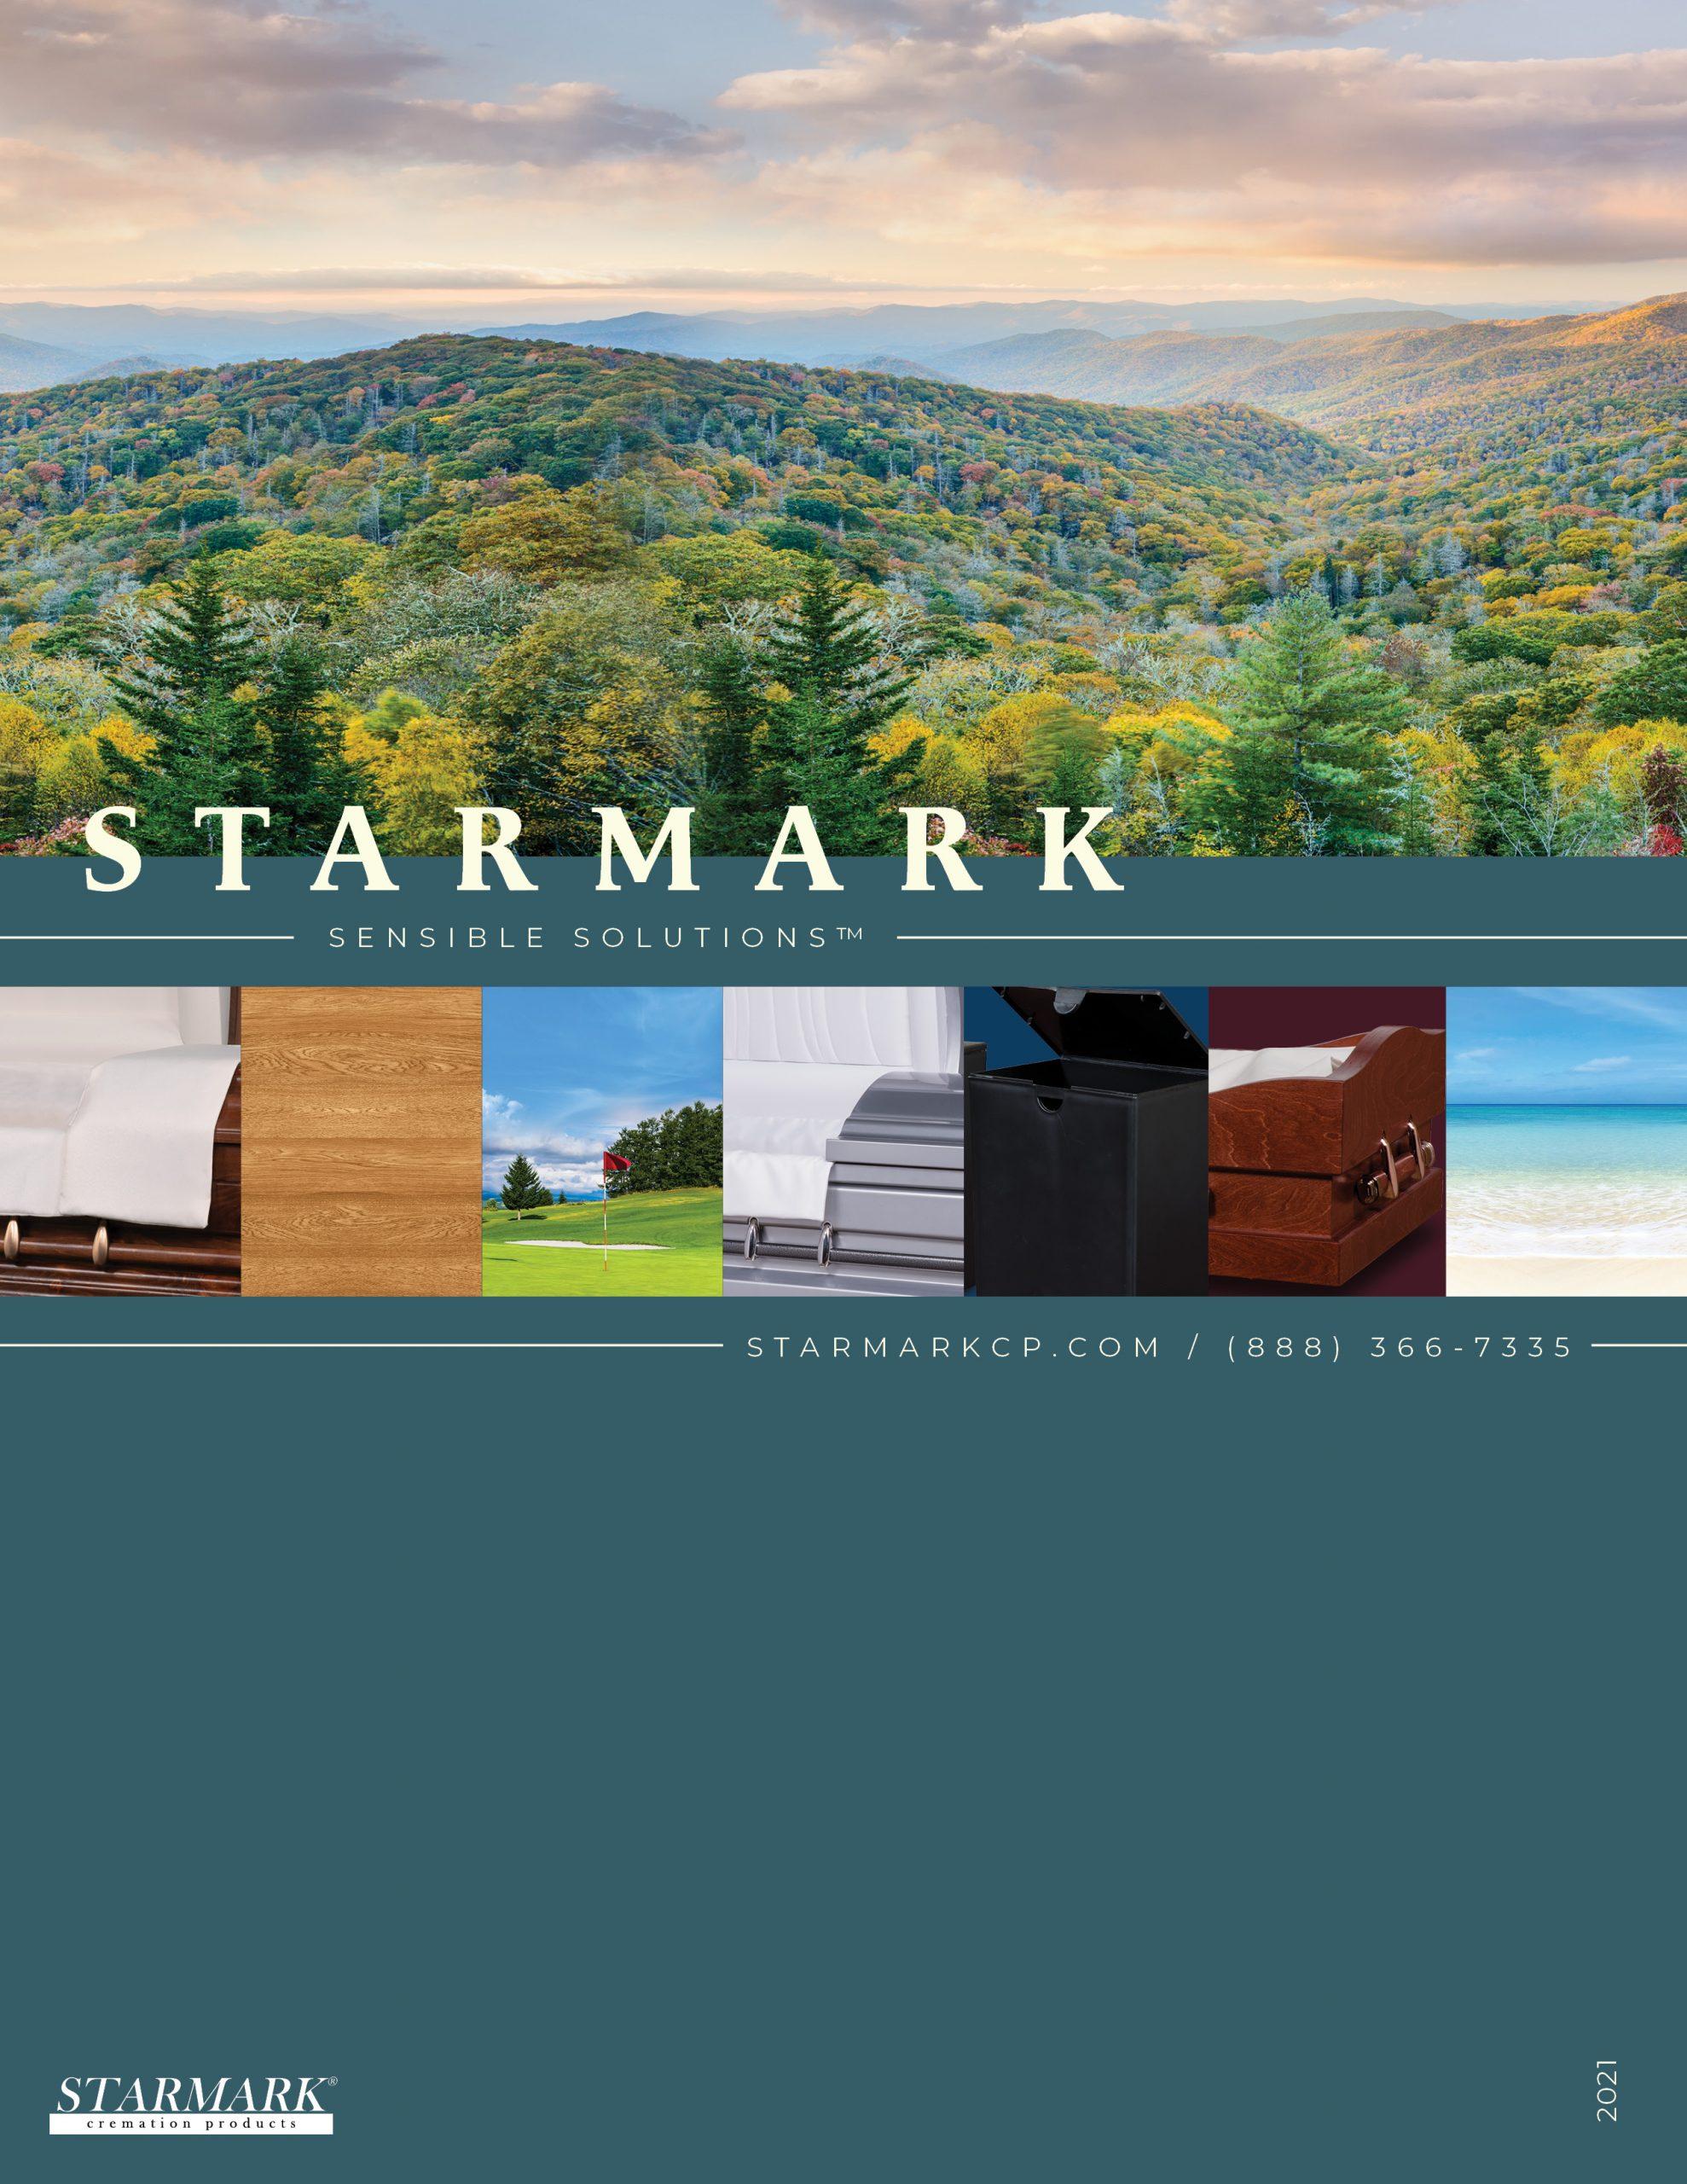 2021 Starmark Sensible Solutions Catalog